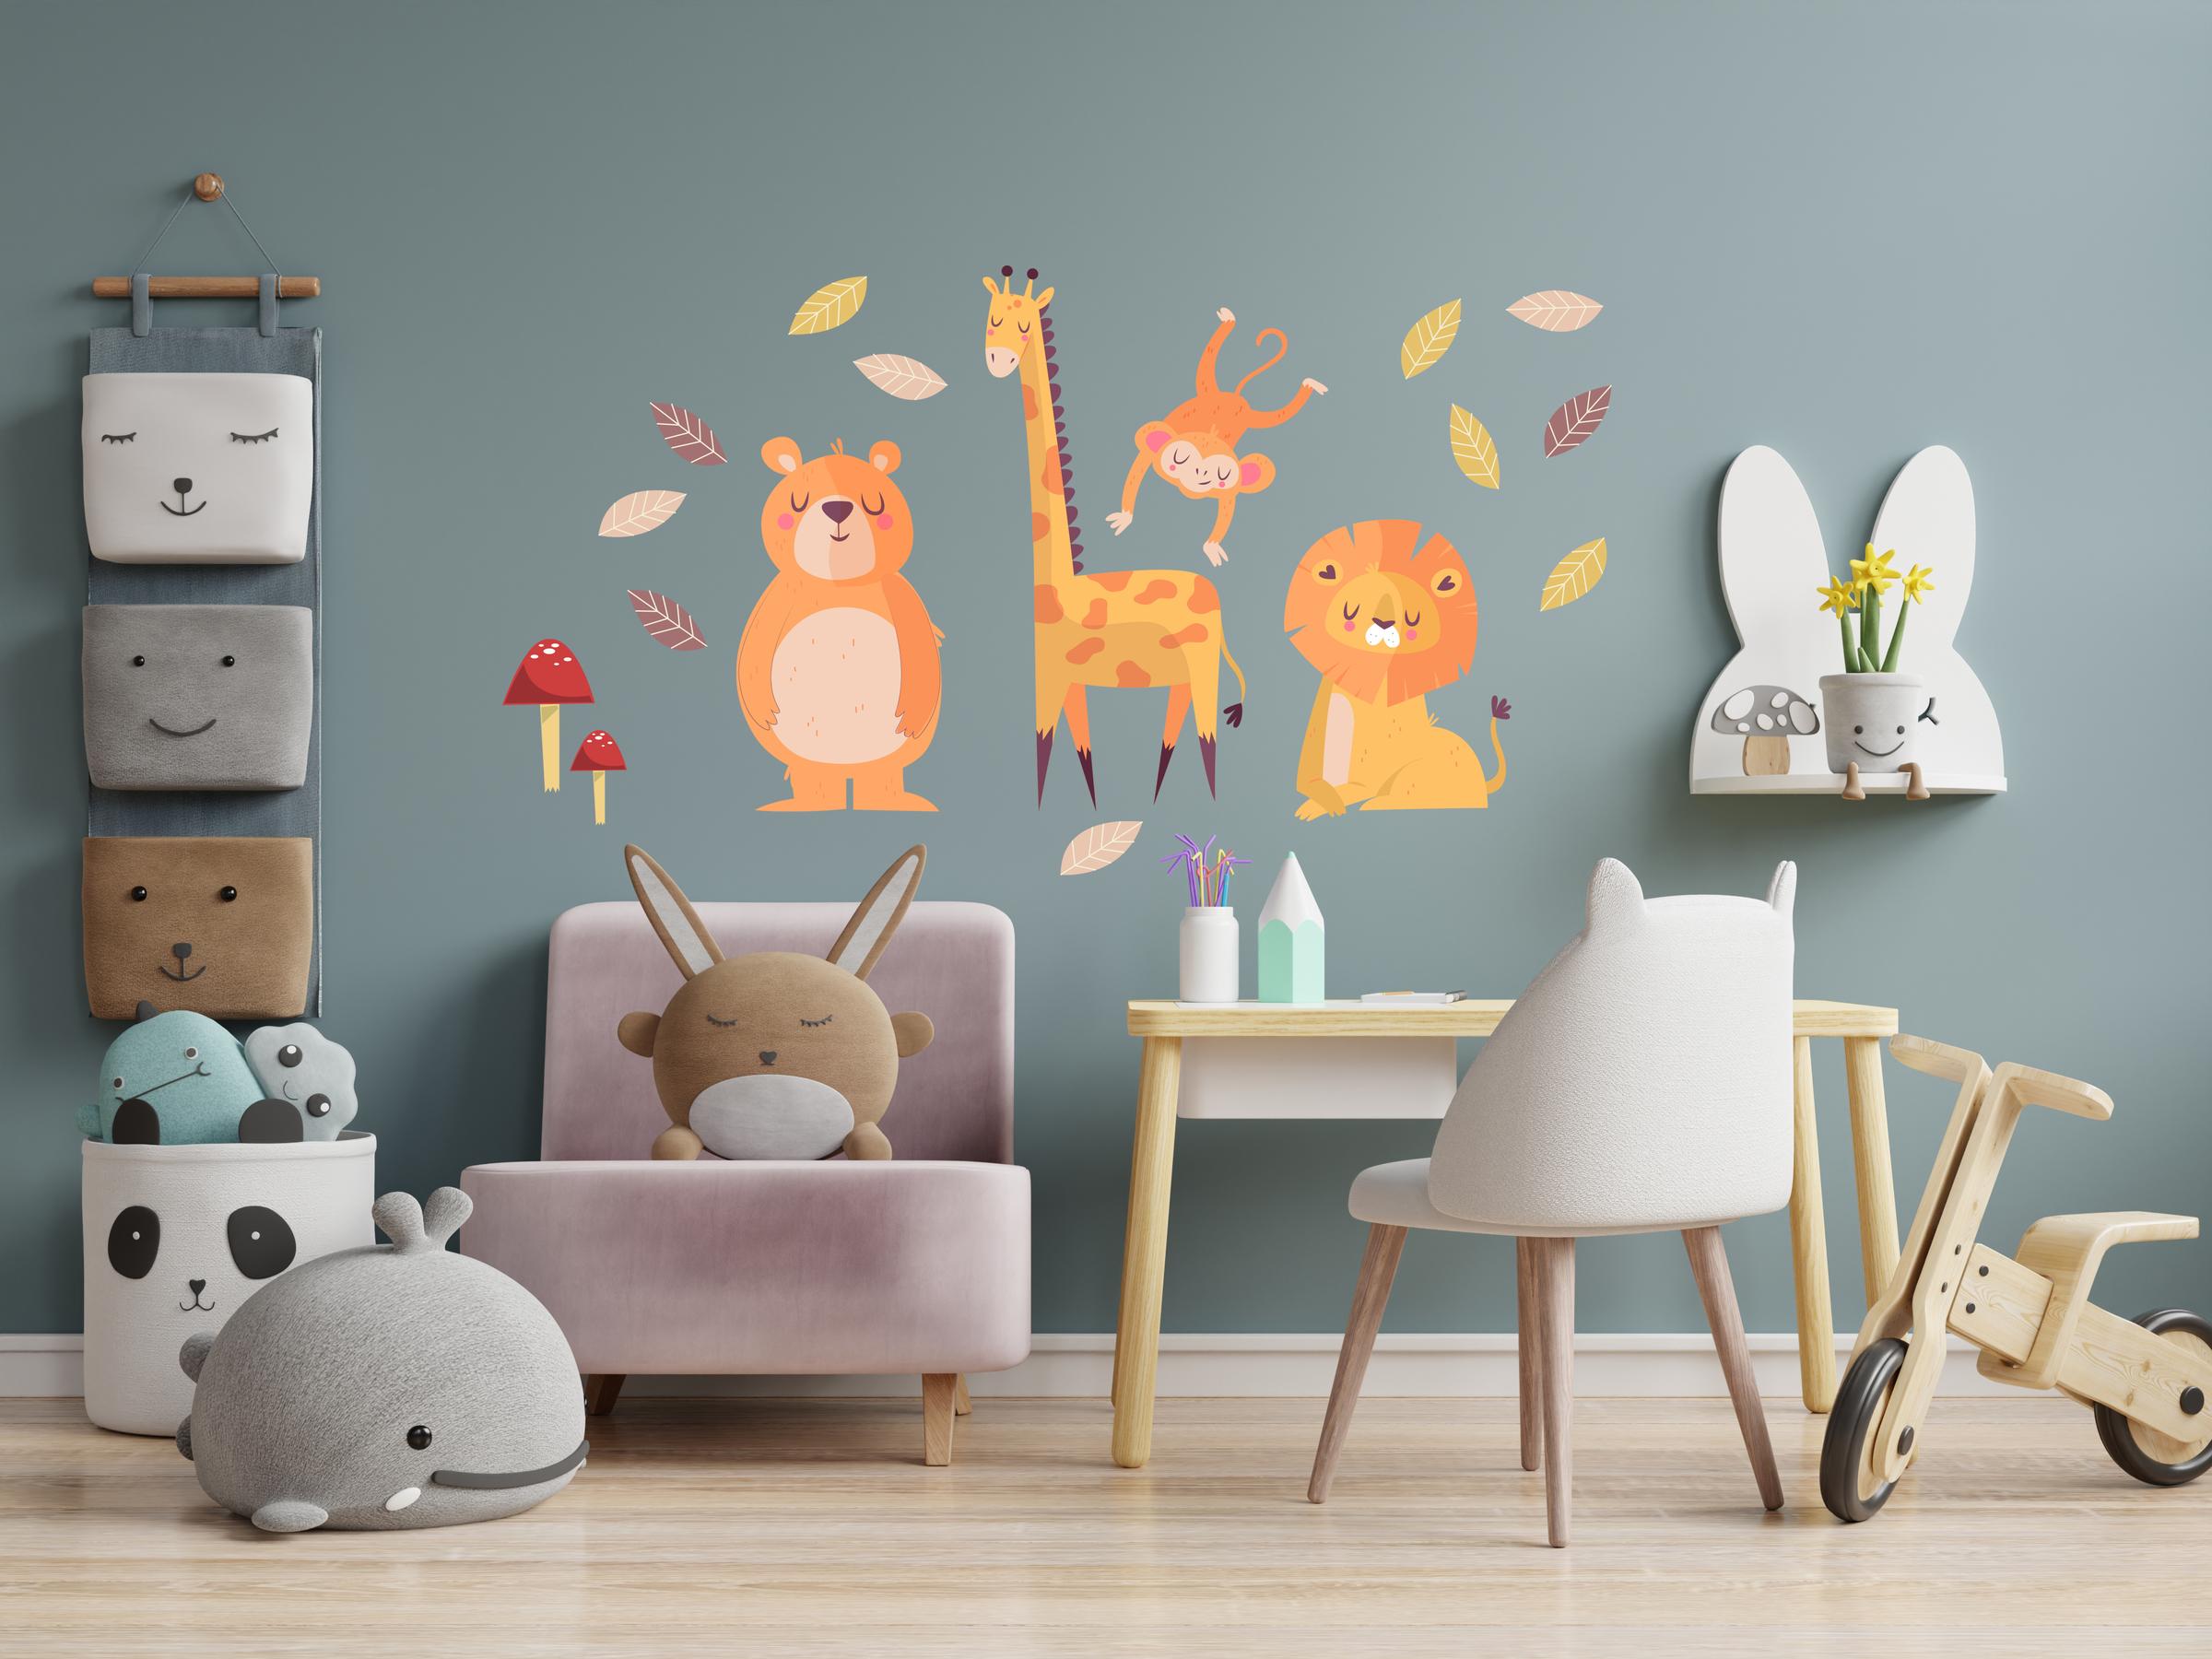 Removable sticker cute animals visual.jpg